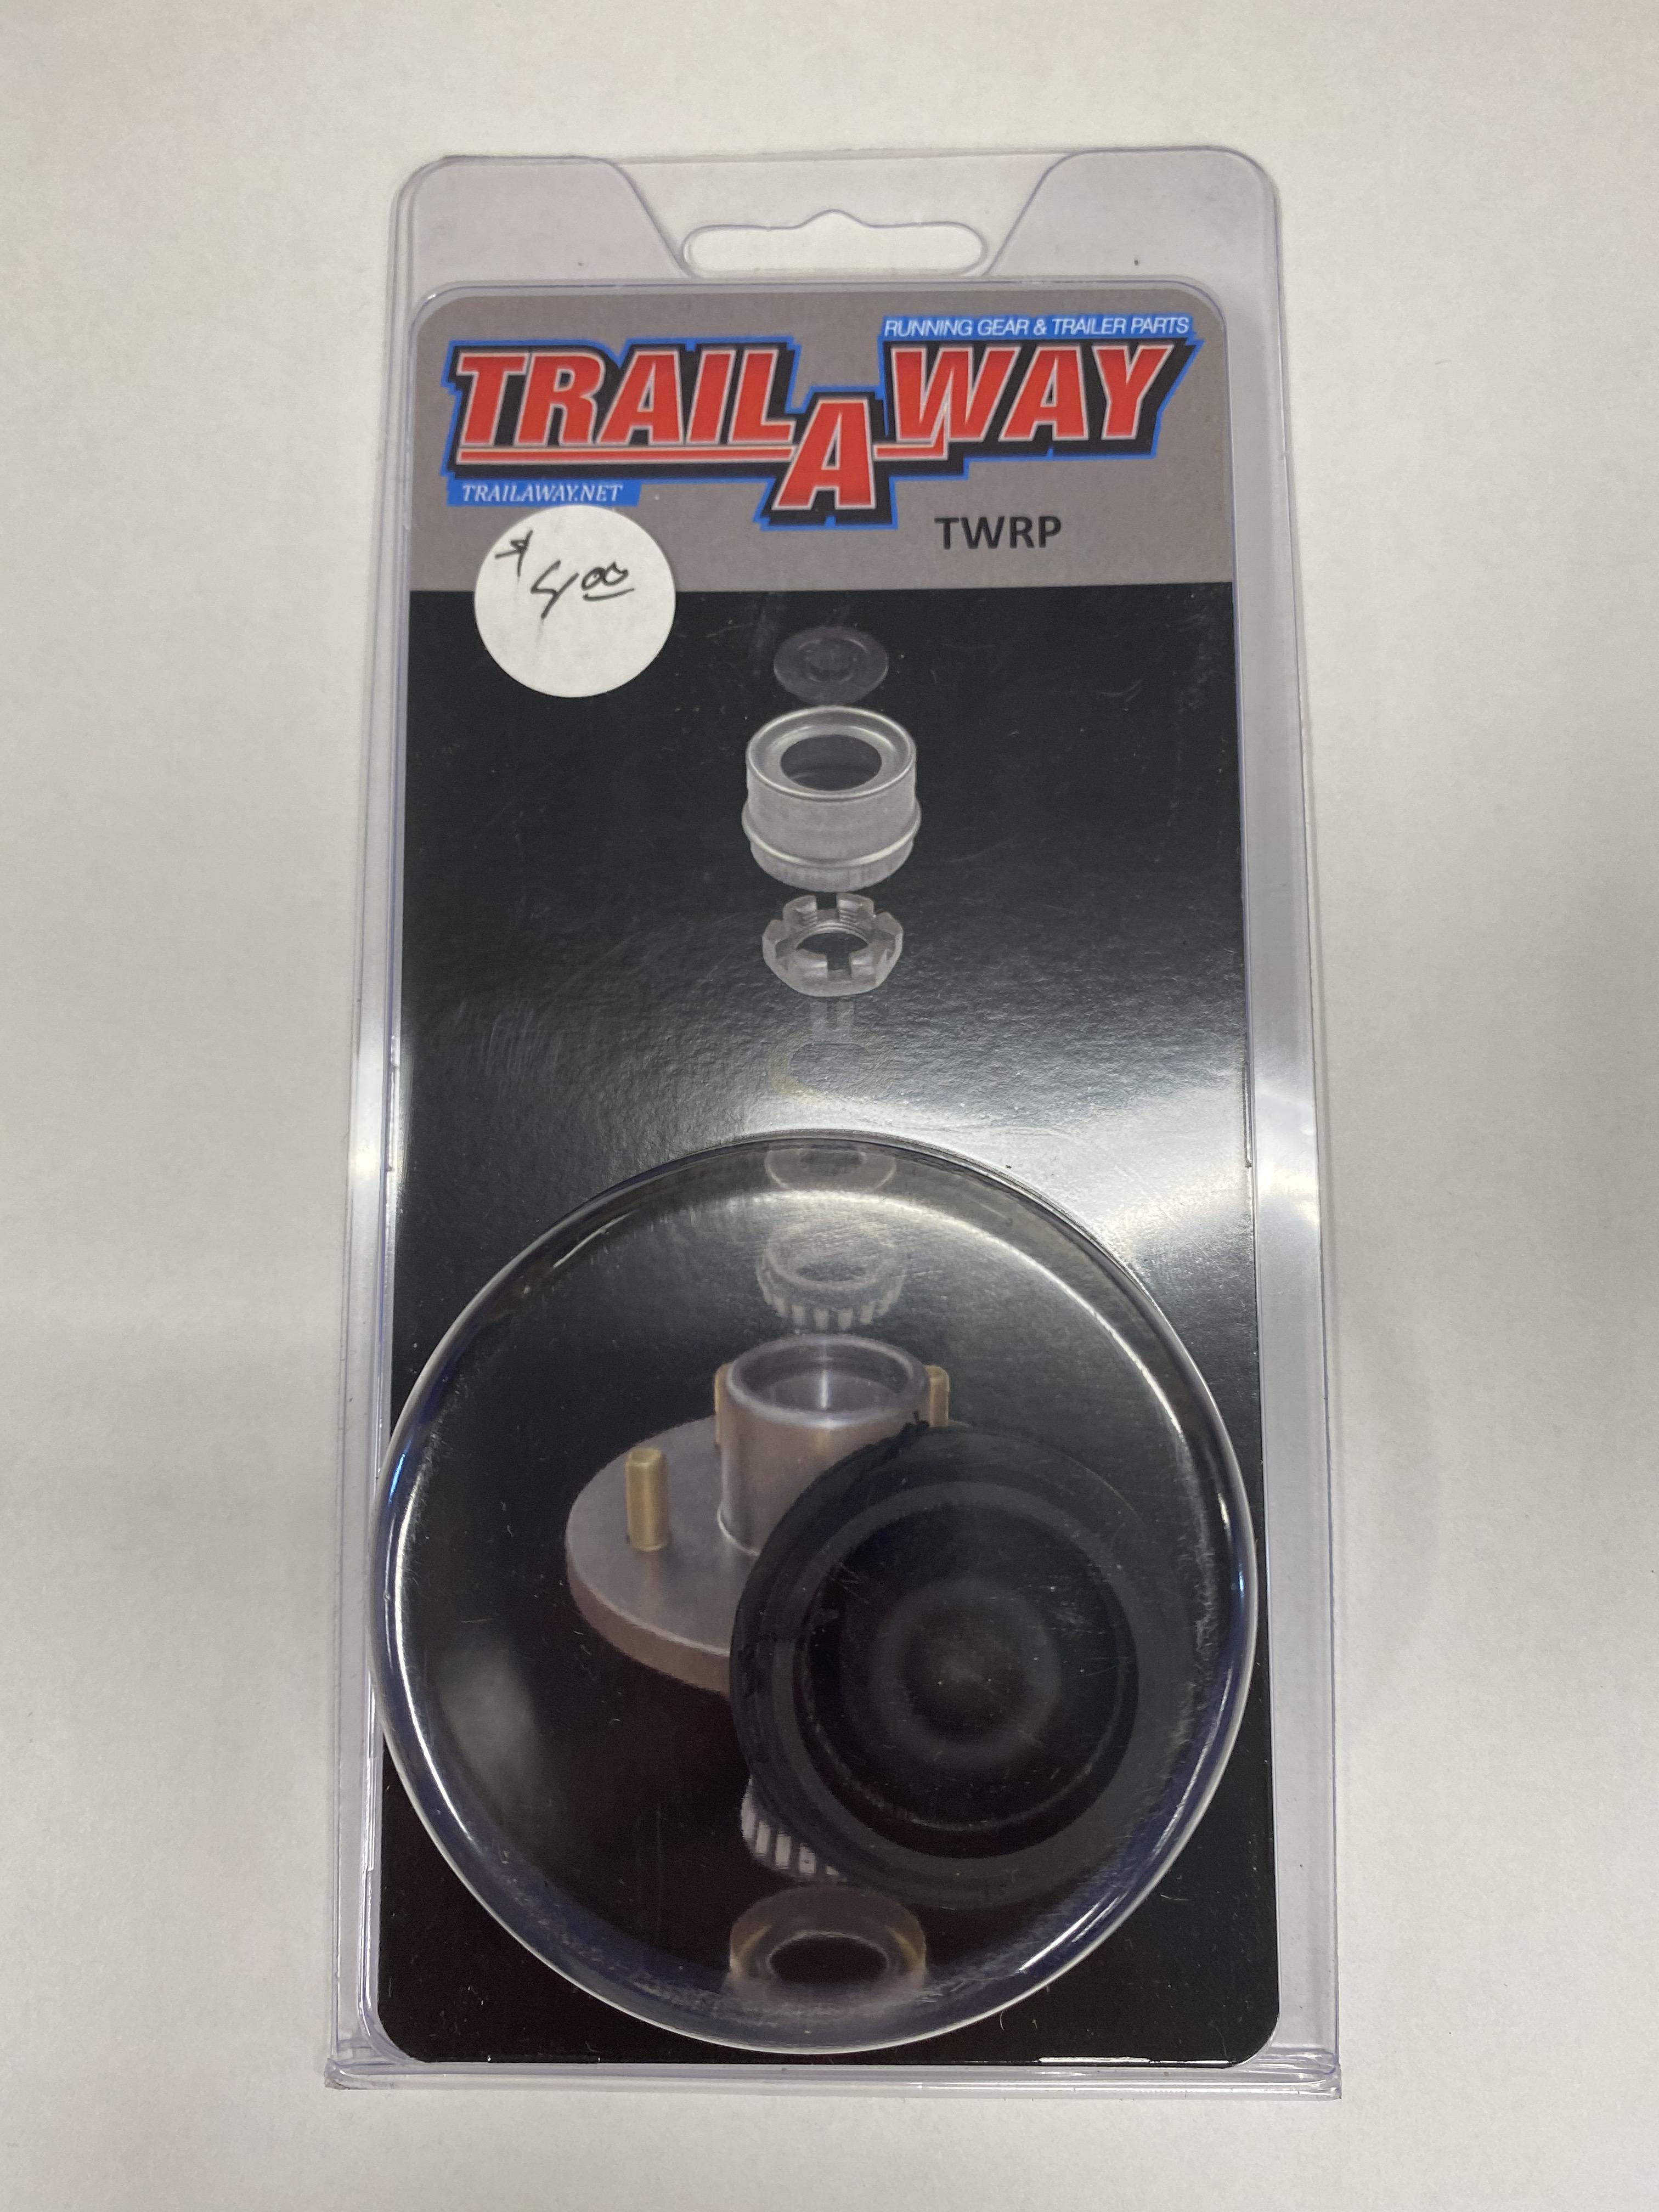 Trail A Way TWRP Dust Cap Rubber Plug Kit